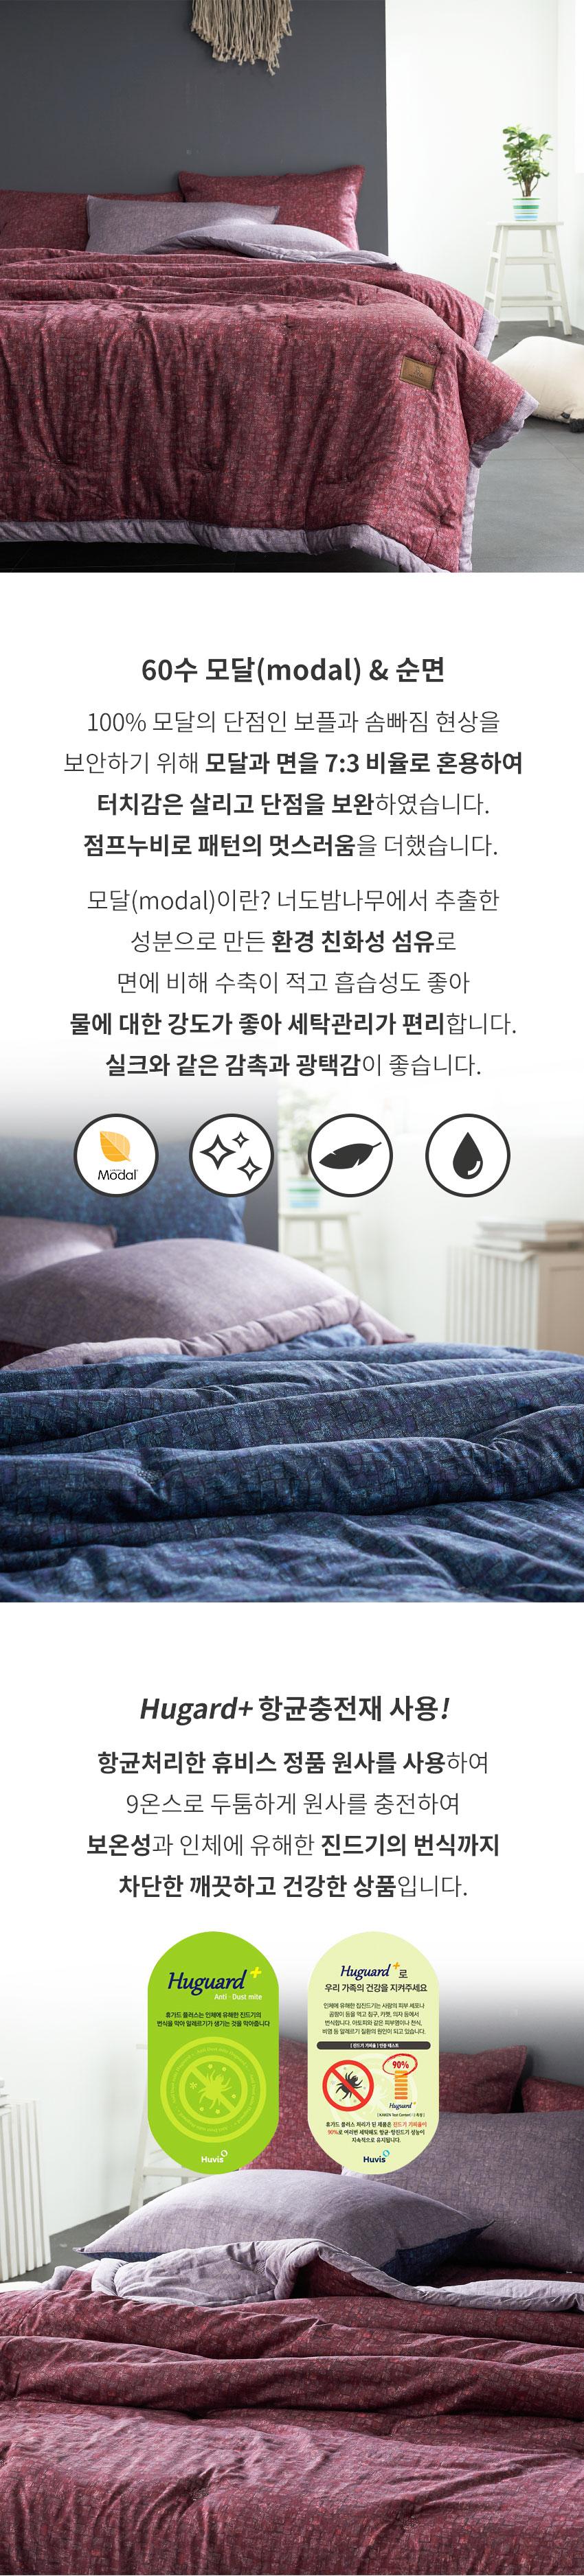 classic_bed_01.jpg